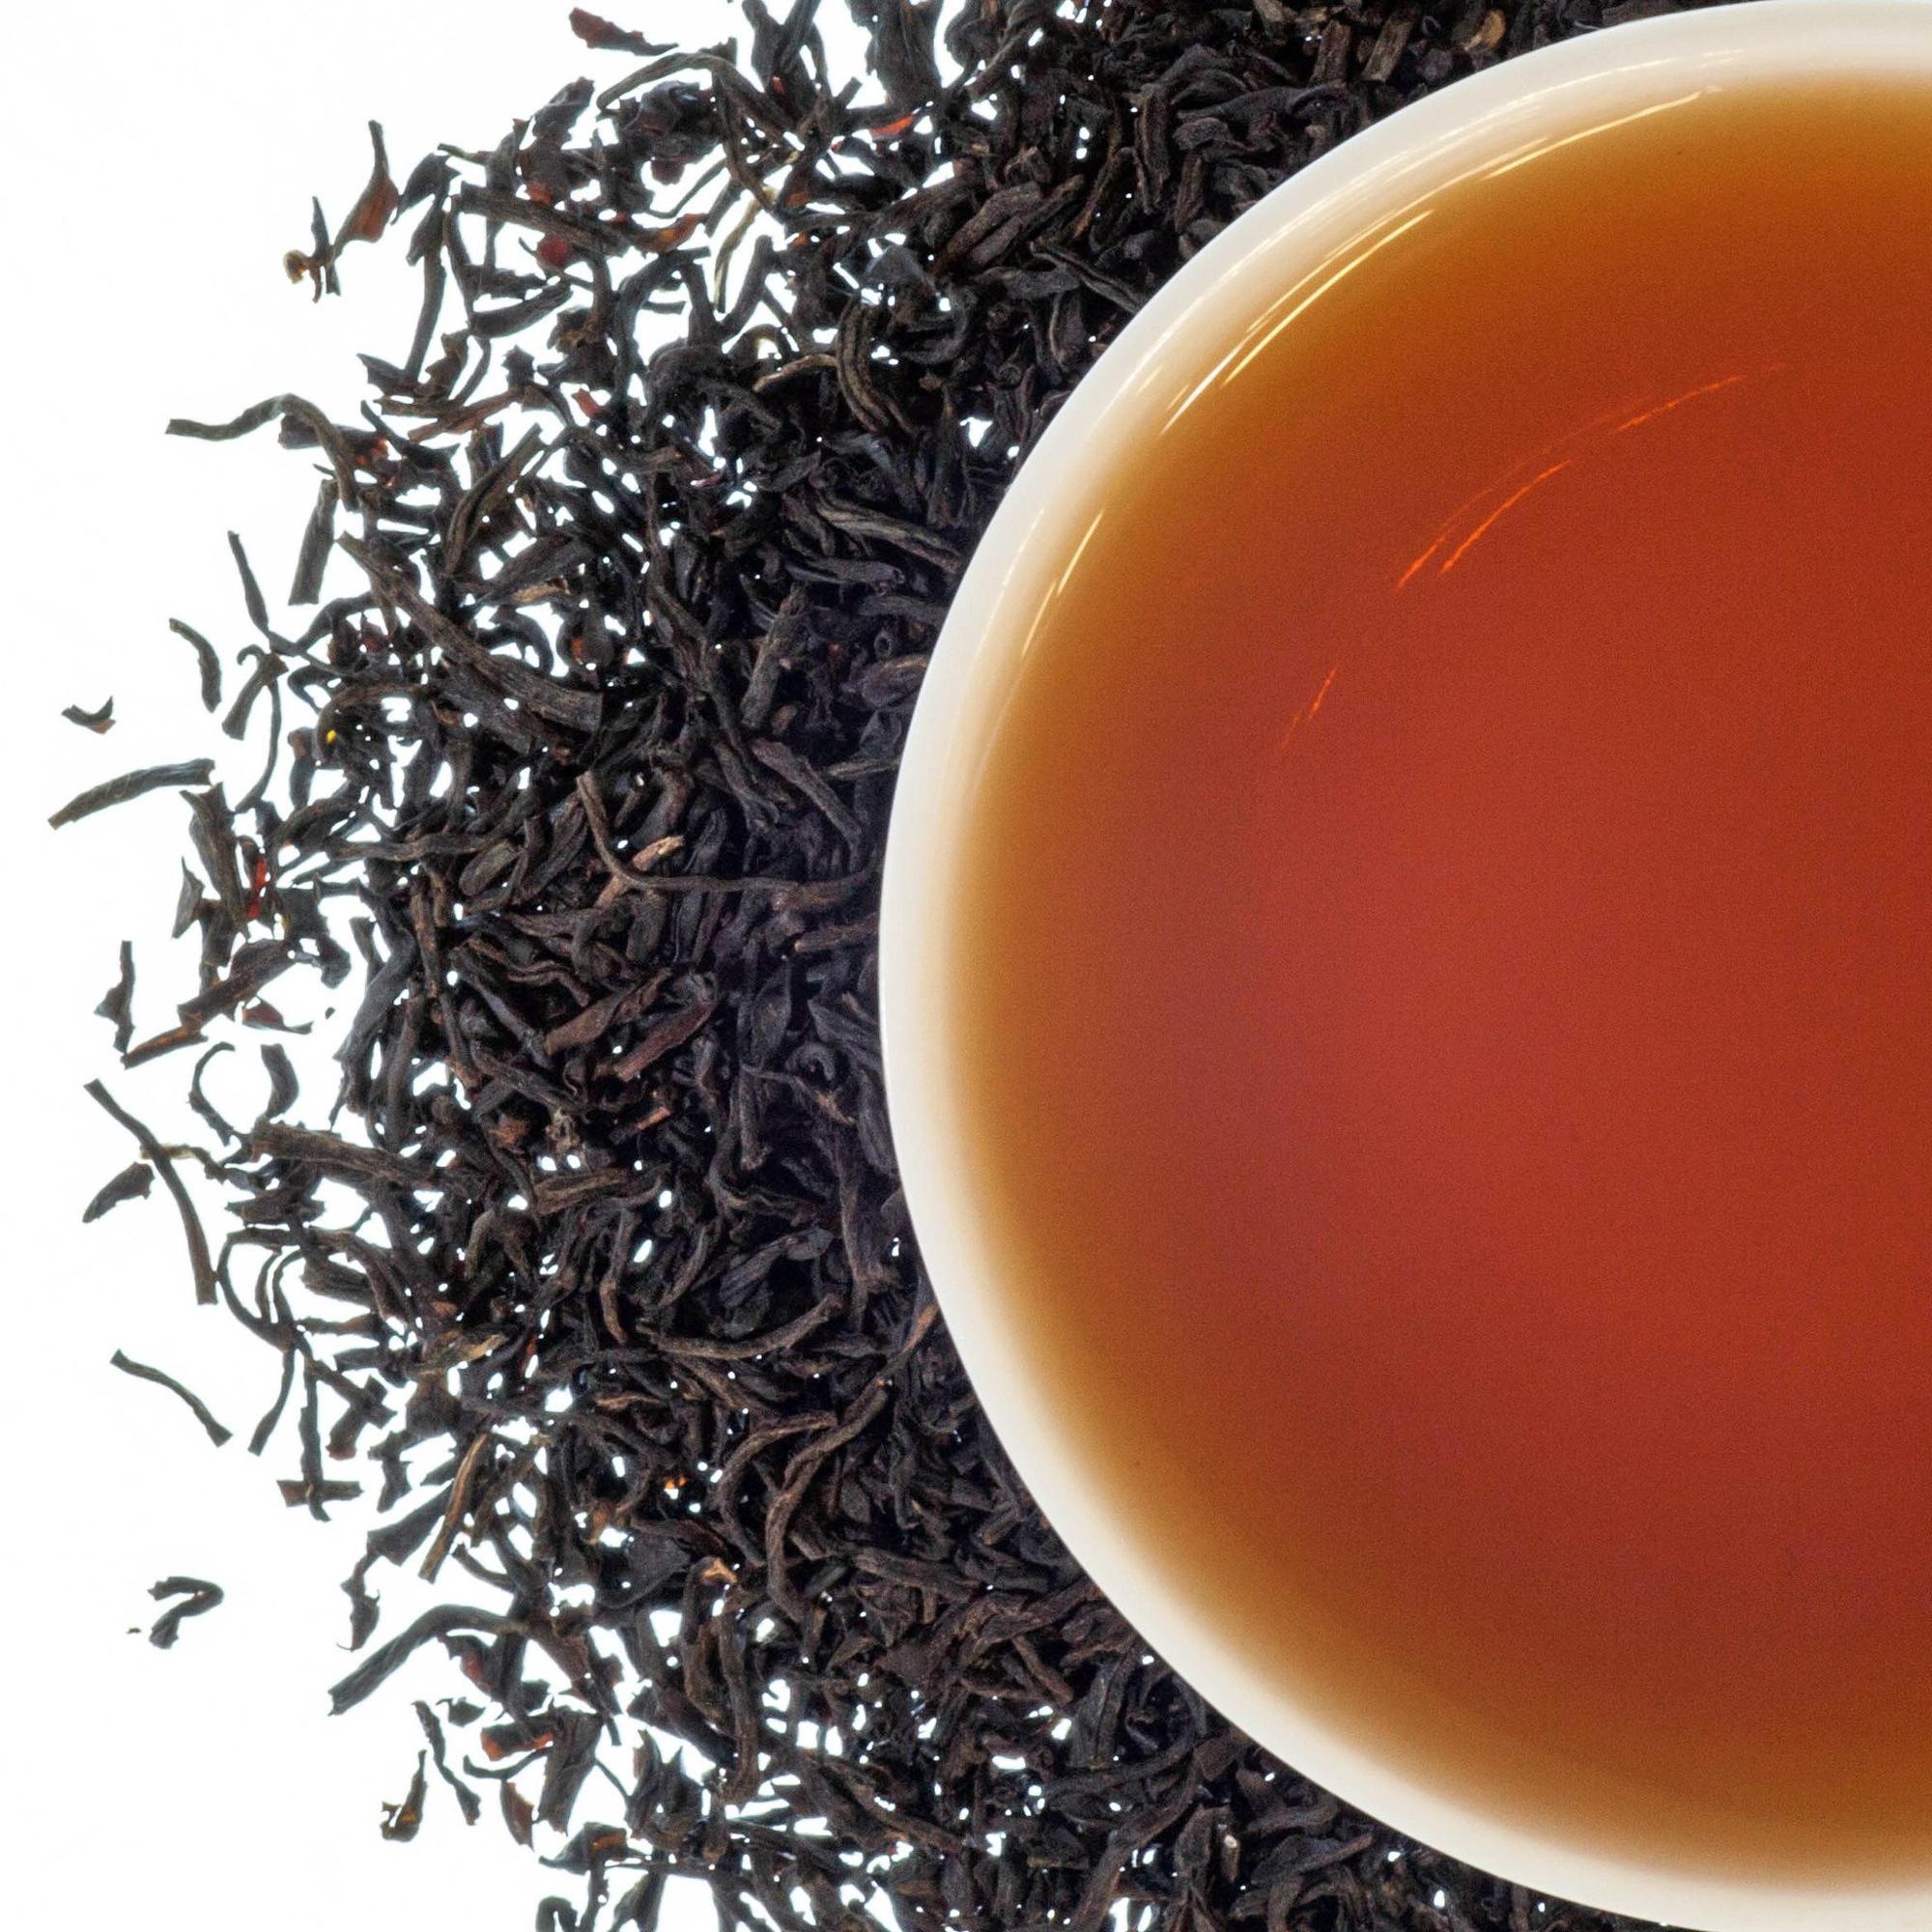 Merlinbird OEM Wholesale Free Sample Organic Natural Pure Black Tea - 4uTea   4uTea.com